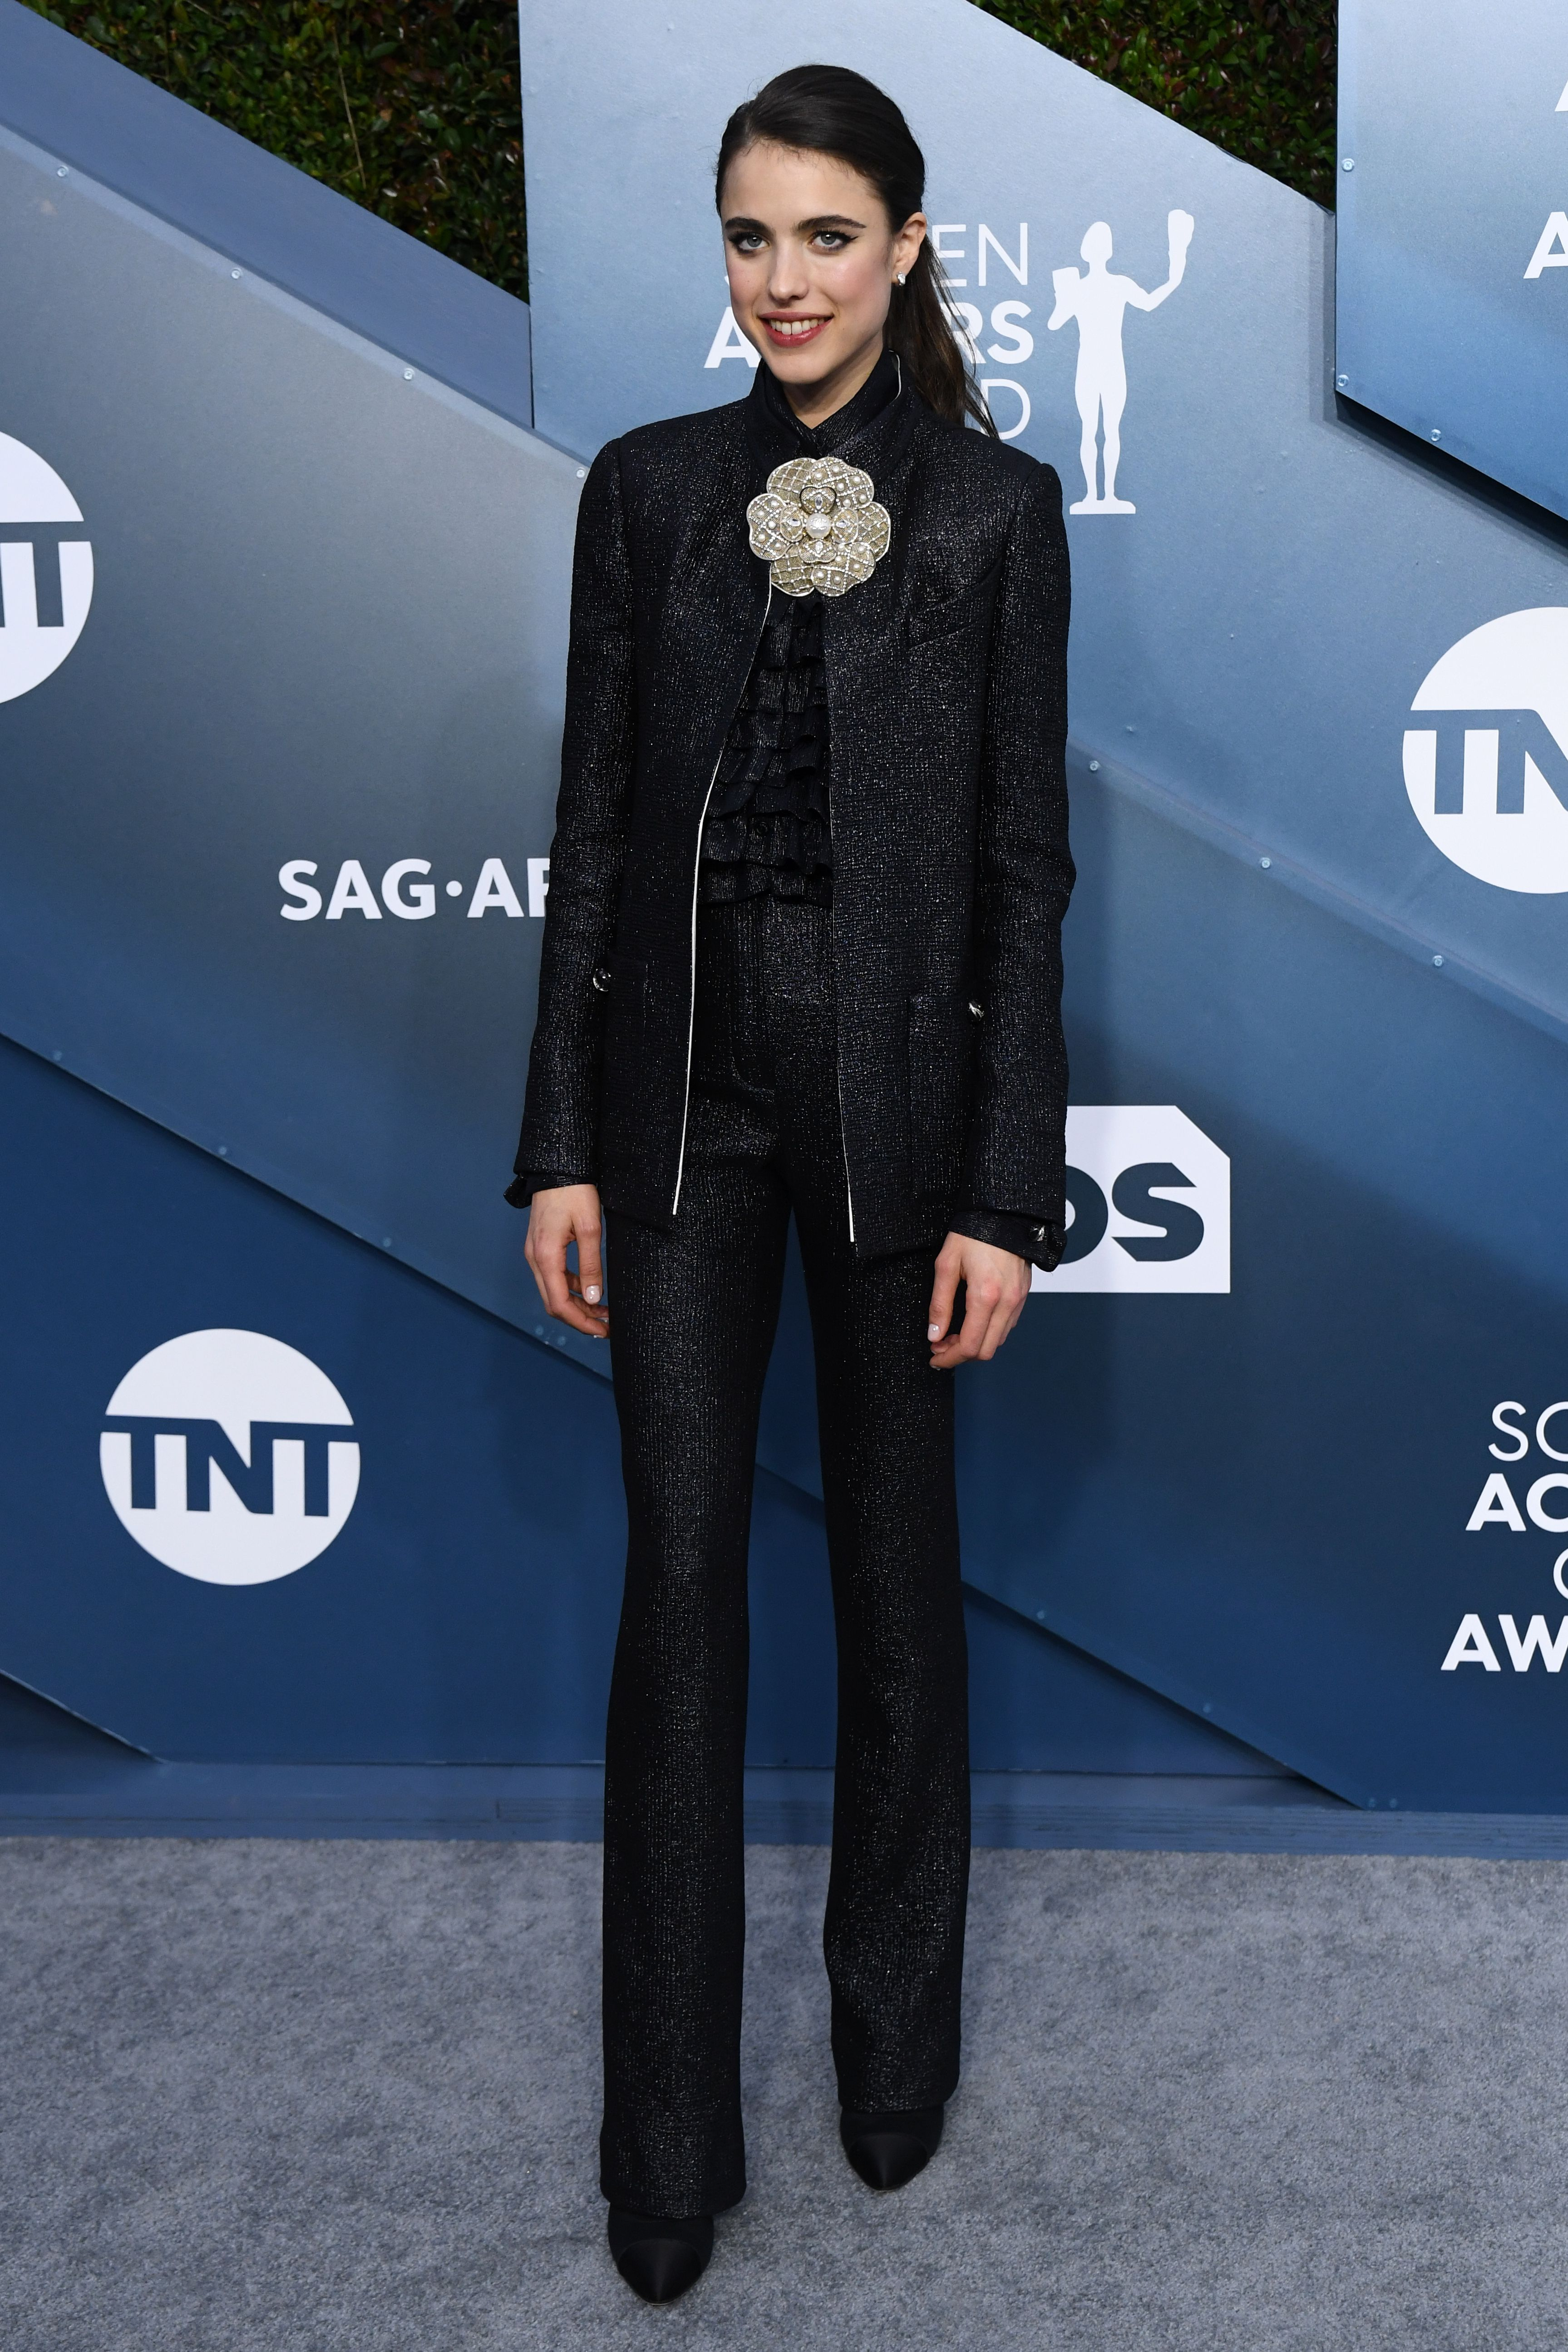 Margaret Qualley26th Annual Screen Actors Guild Awards, Arrivals, Shrine Auditorium, Los Angeles, USA - 19 Jan 2020